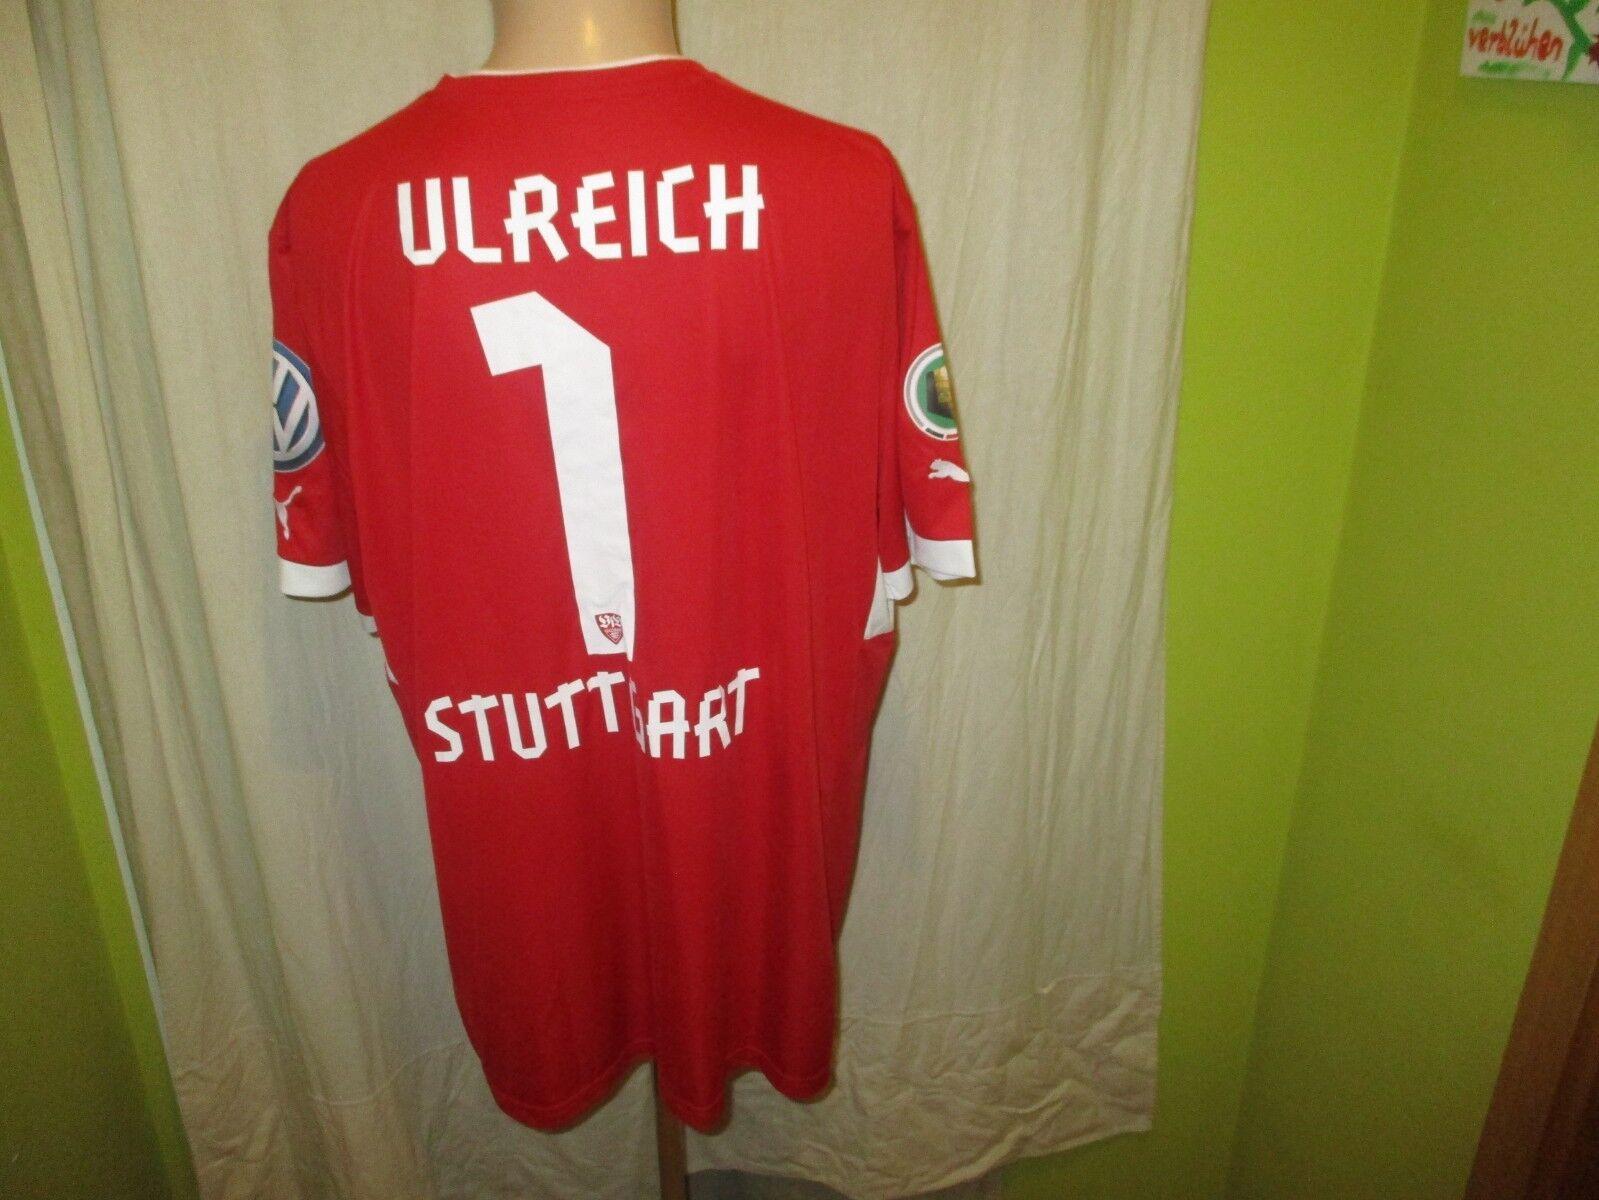 VfB Stuttgart Puma DFB-Pokal Torwart Trikot Trikot Trikot 2013 14 + Nr.1 Ulreich Gr.XXL Neu 839b72